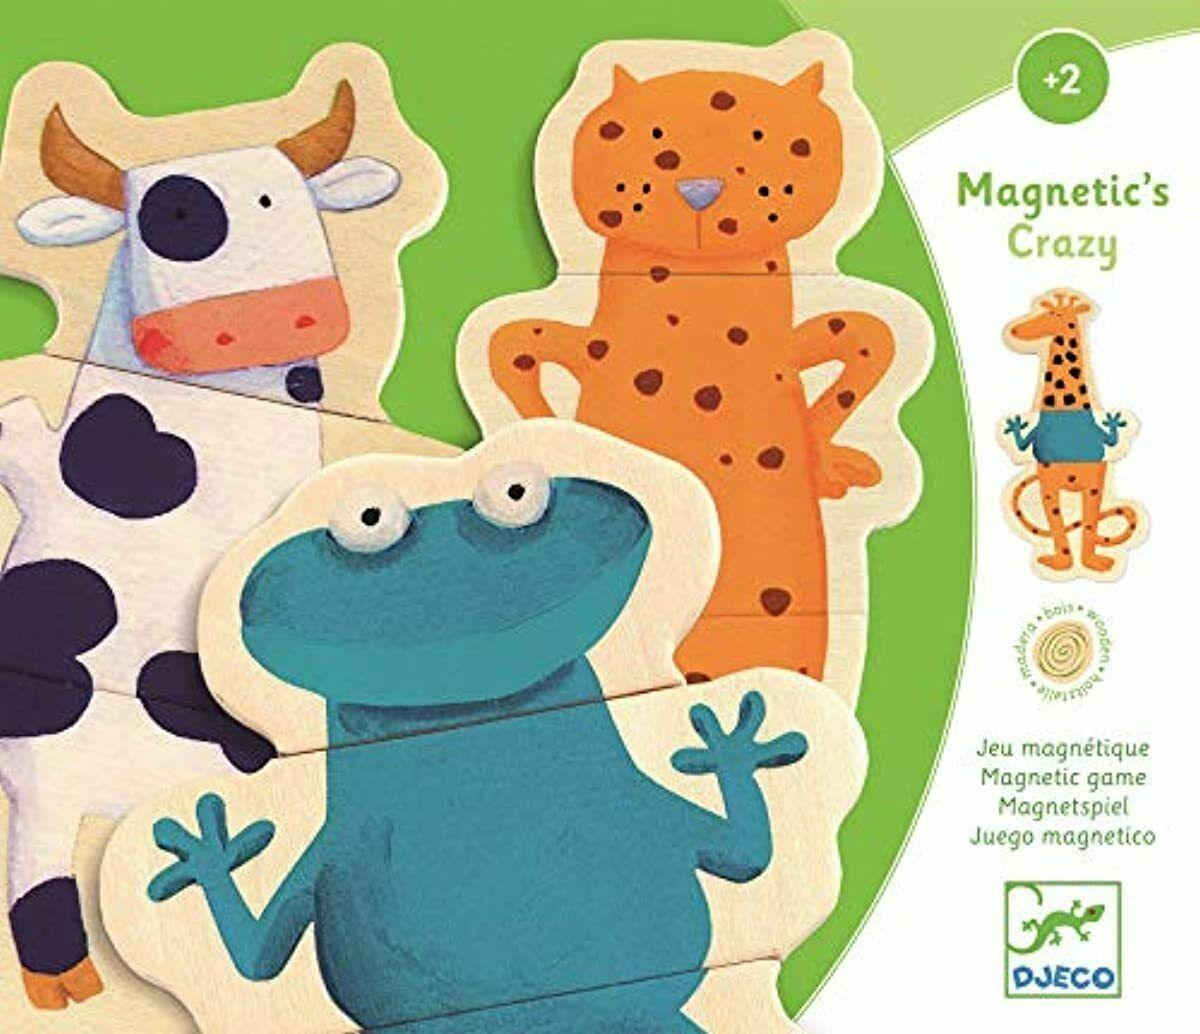 1984 - Magnetics Image